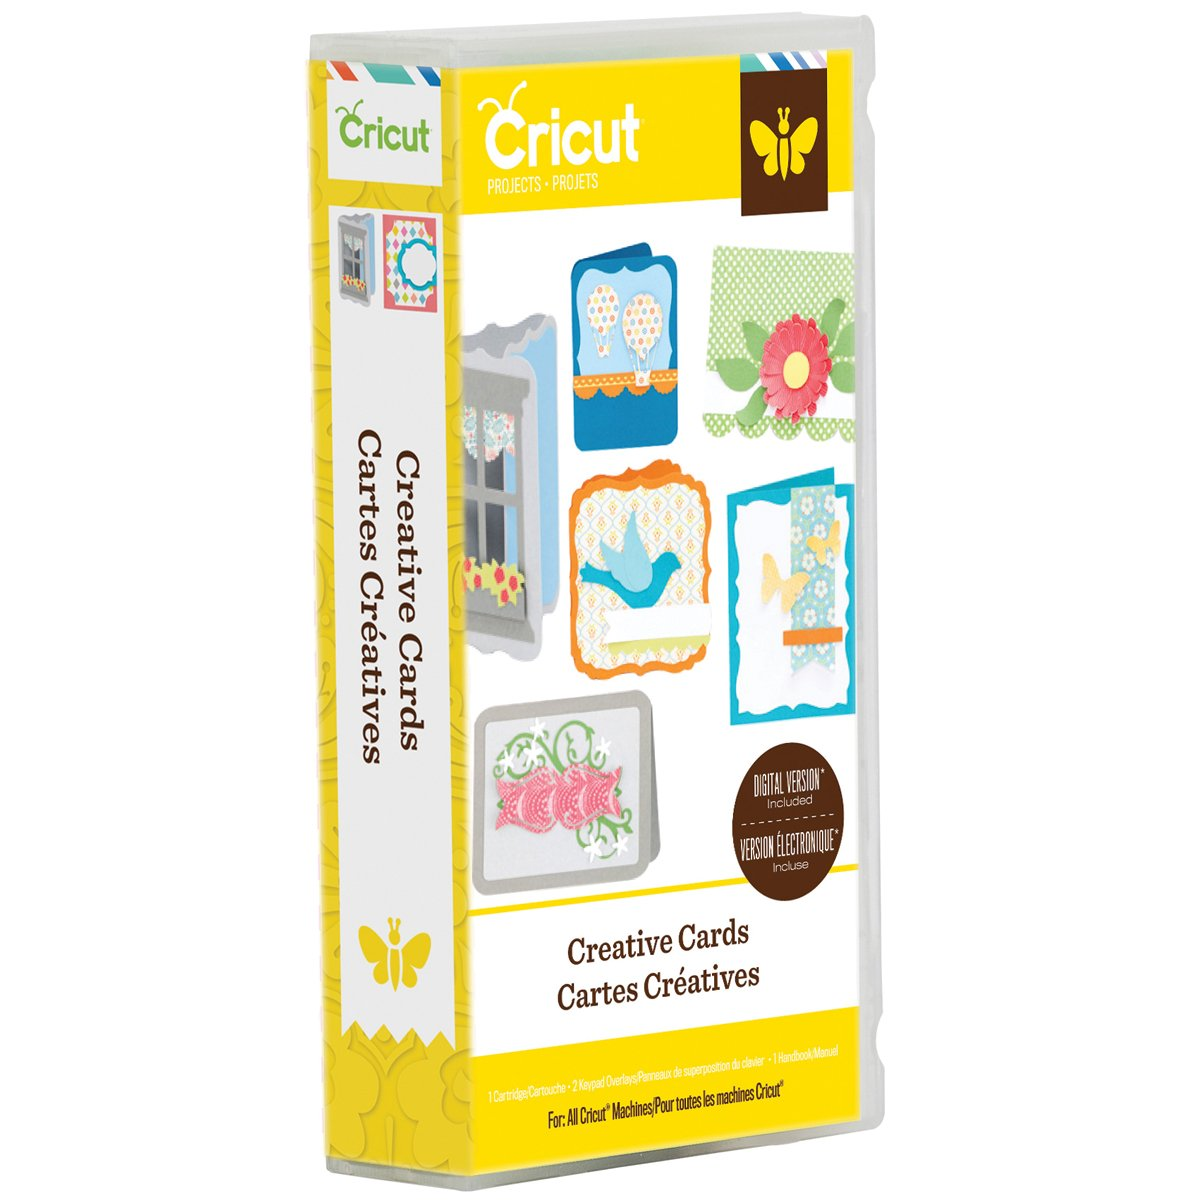 Cricut 2001984 Project Creative Cards Cartridge product image